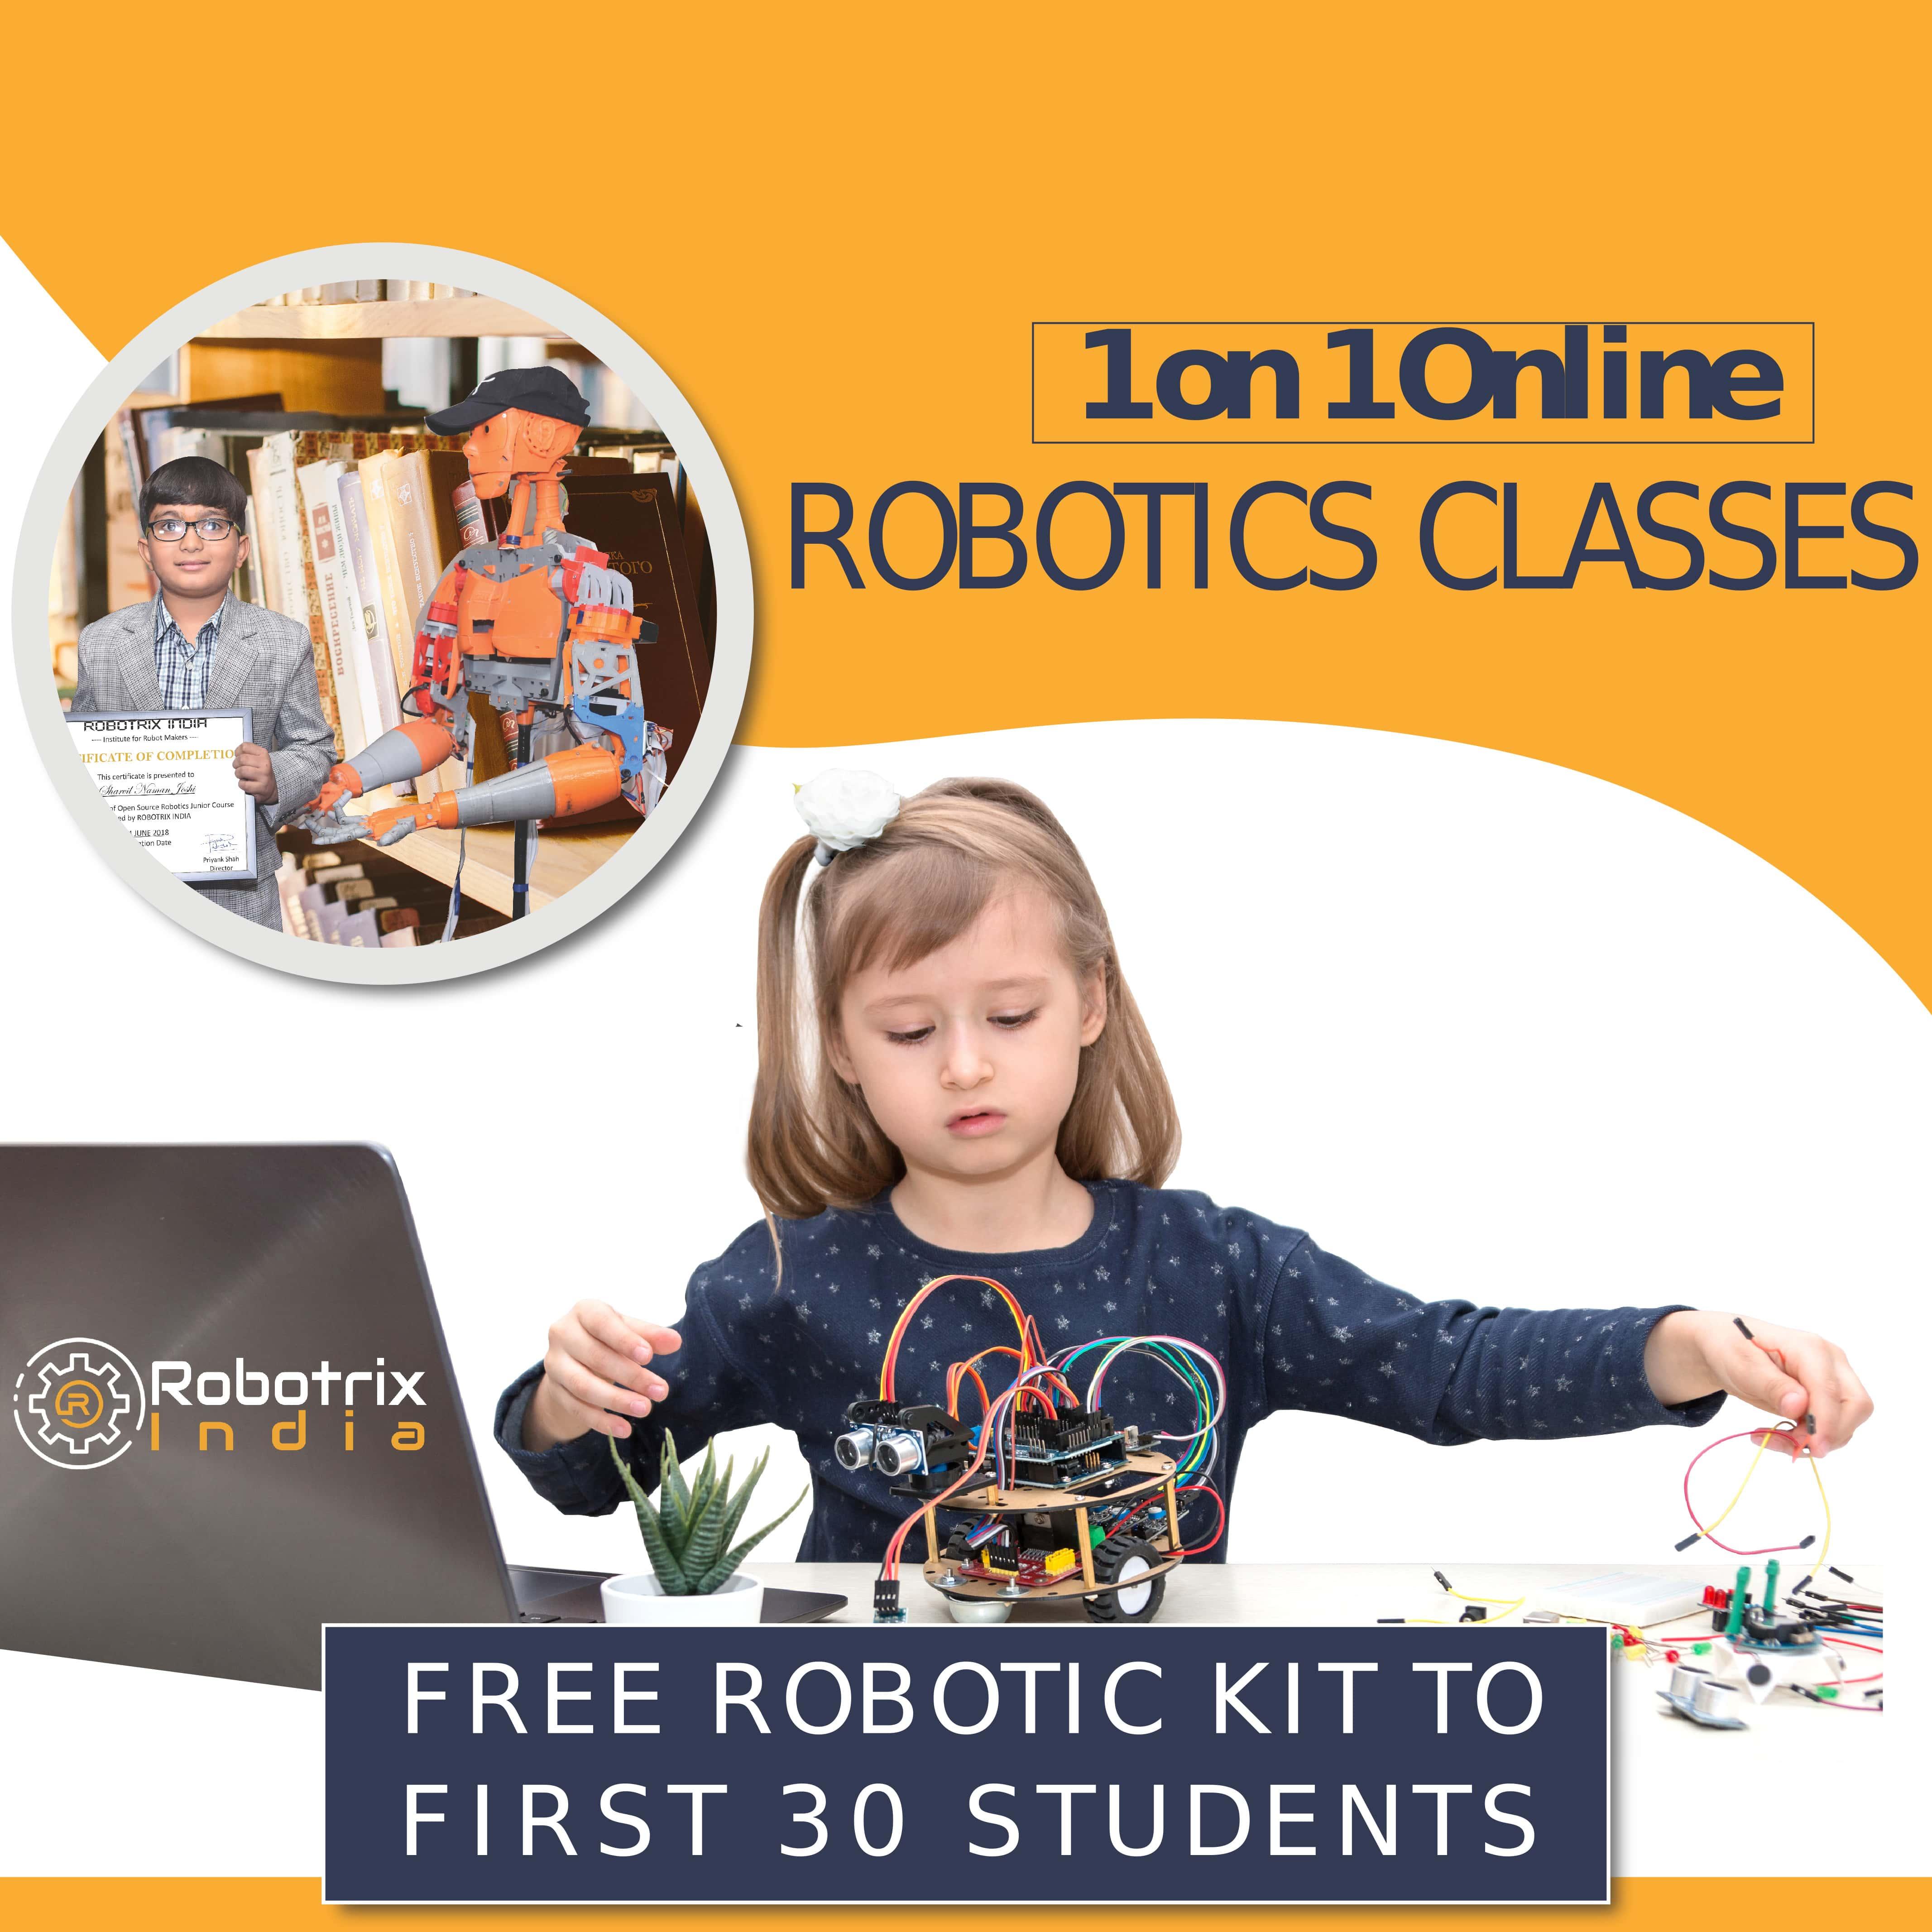 Robotrix India